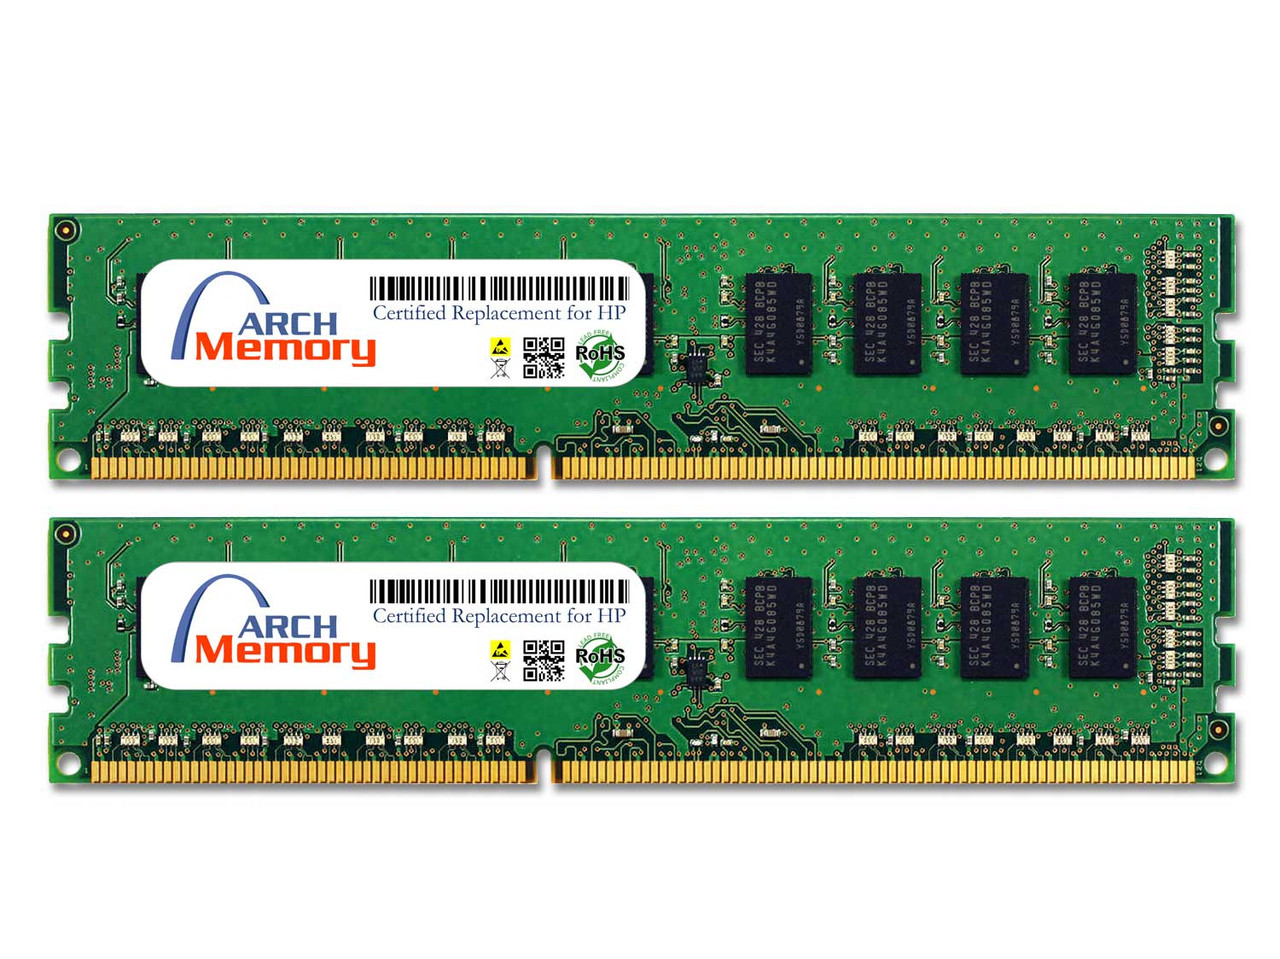 8GB A2H31AV (2 x 4GB) 240-Pin DDR3 ECC UDIMM RAM | Memory for HP